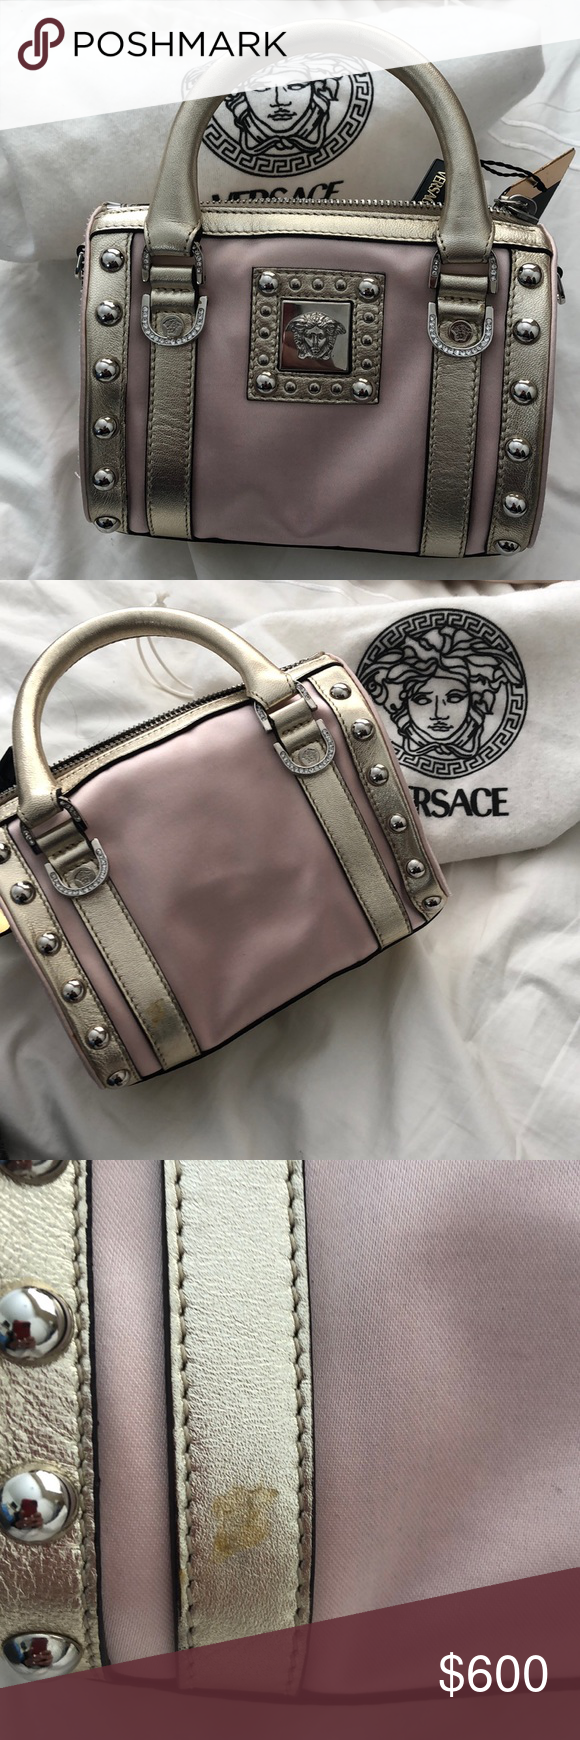 Vintage Versace Small Doctors Bag Brand New Never Used Small Versace  Doctors Bag Ping and Gold b43b98cb6801d